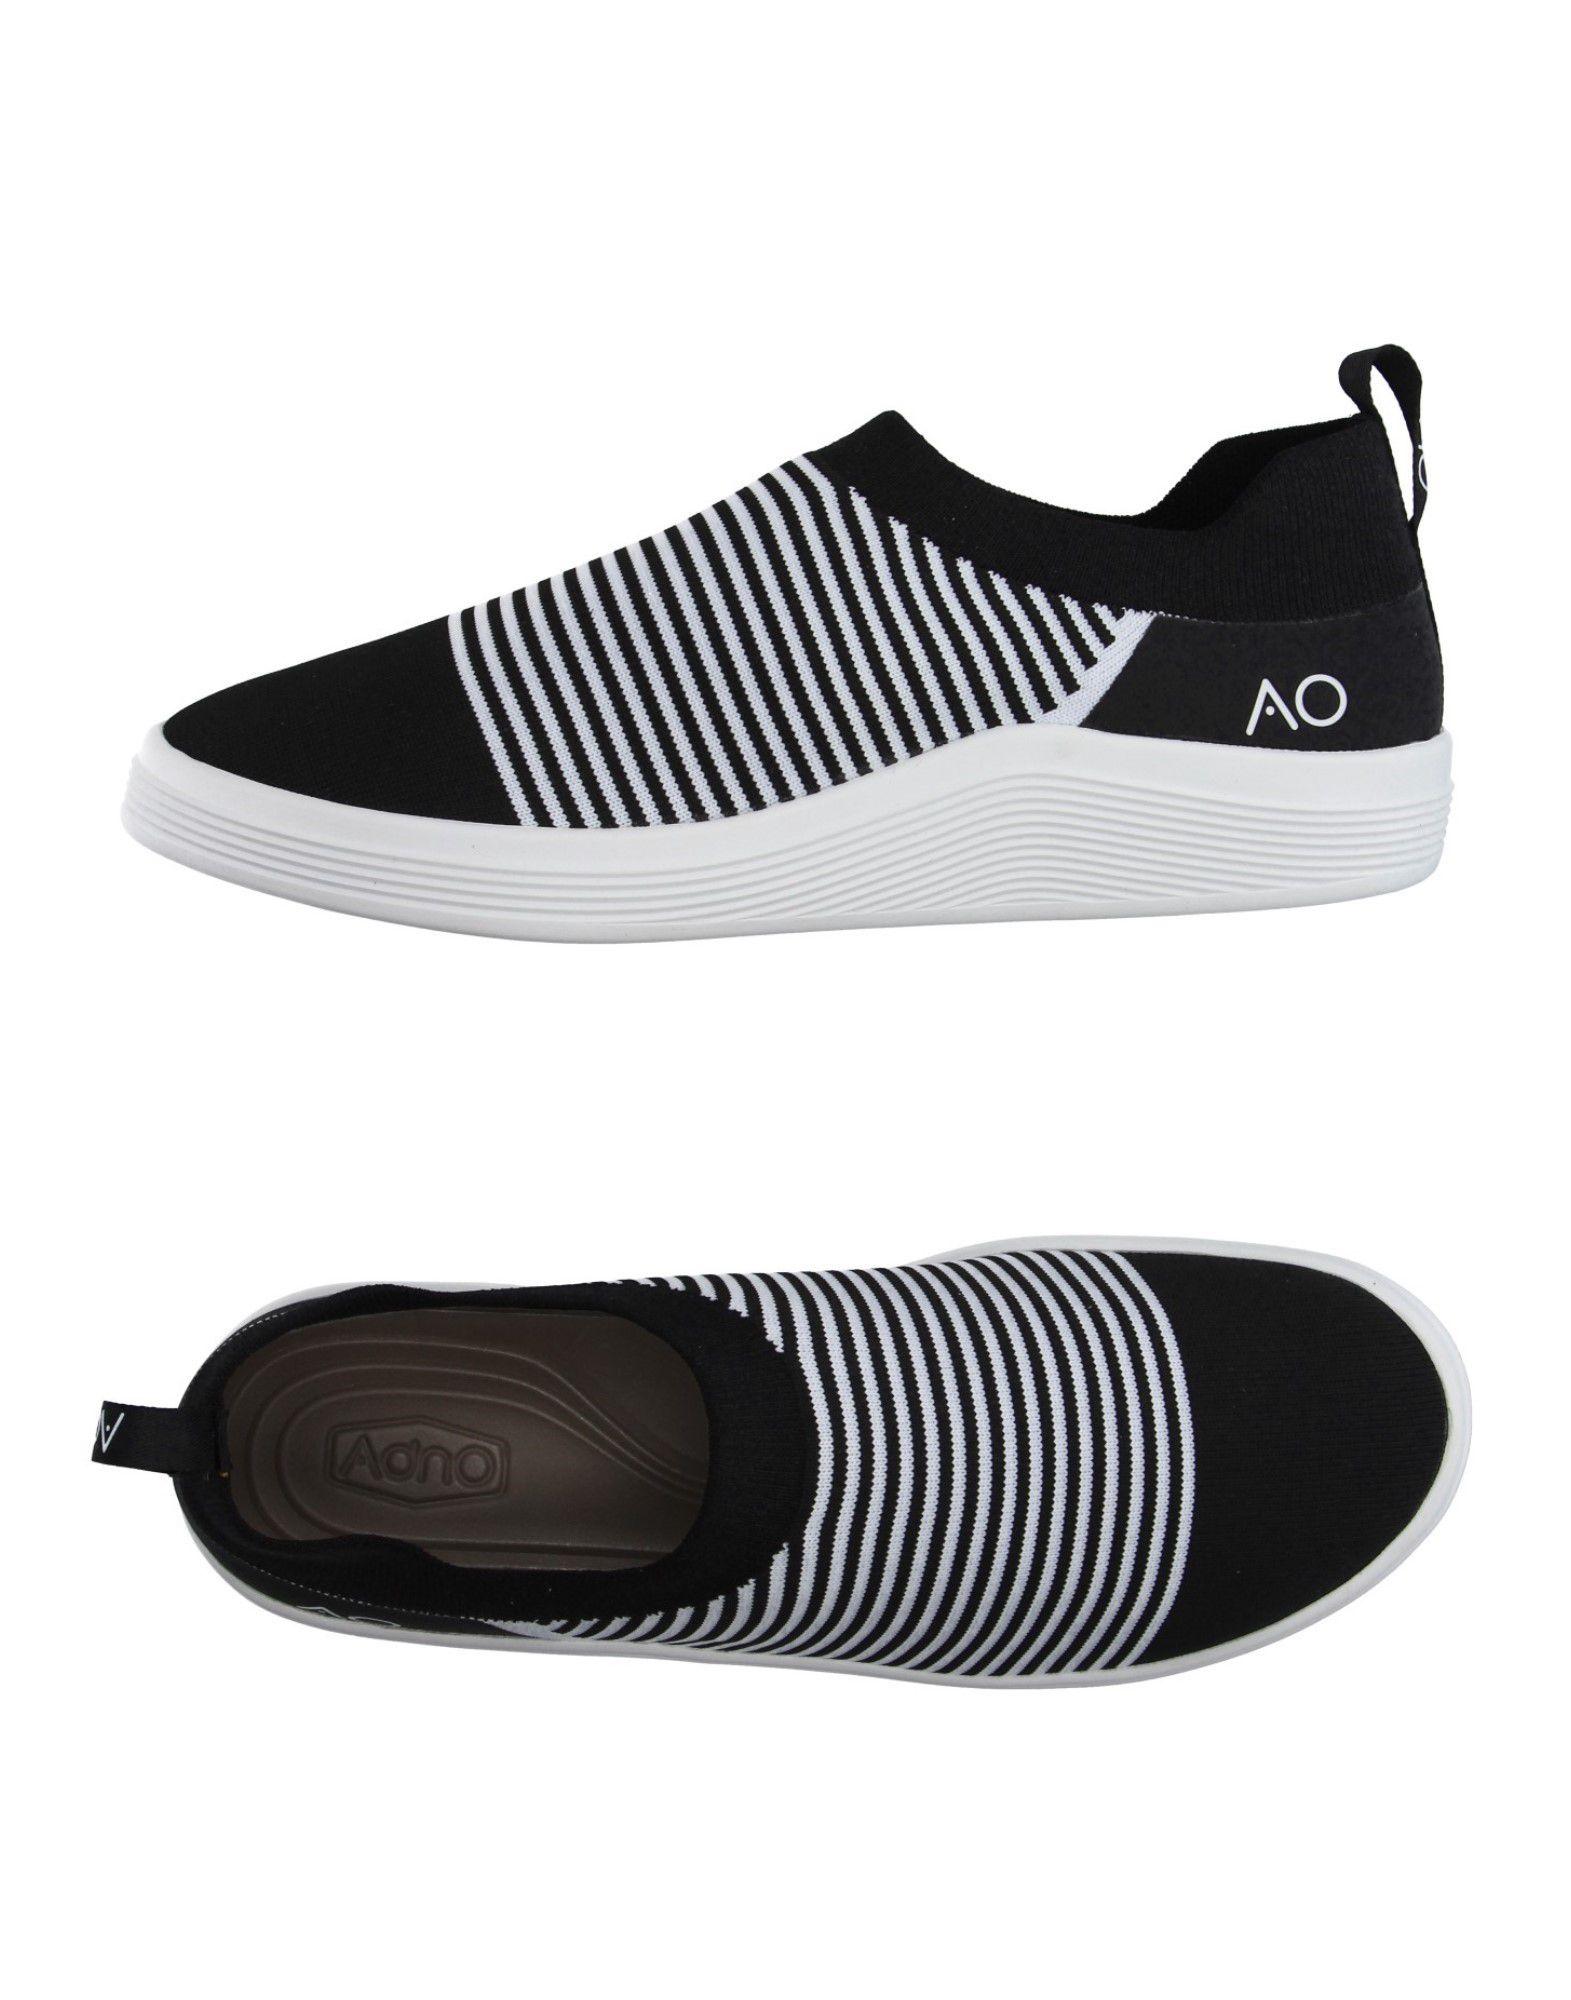 Rabatt echte  Schuhe Adno® Sneakers Herren  echte 11148196SJ 24b50e